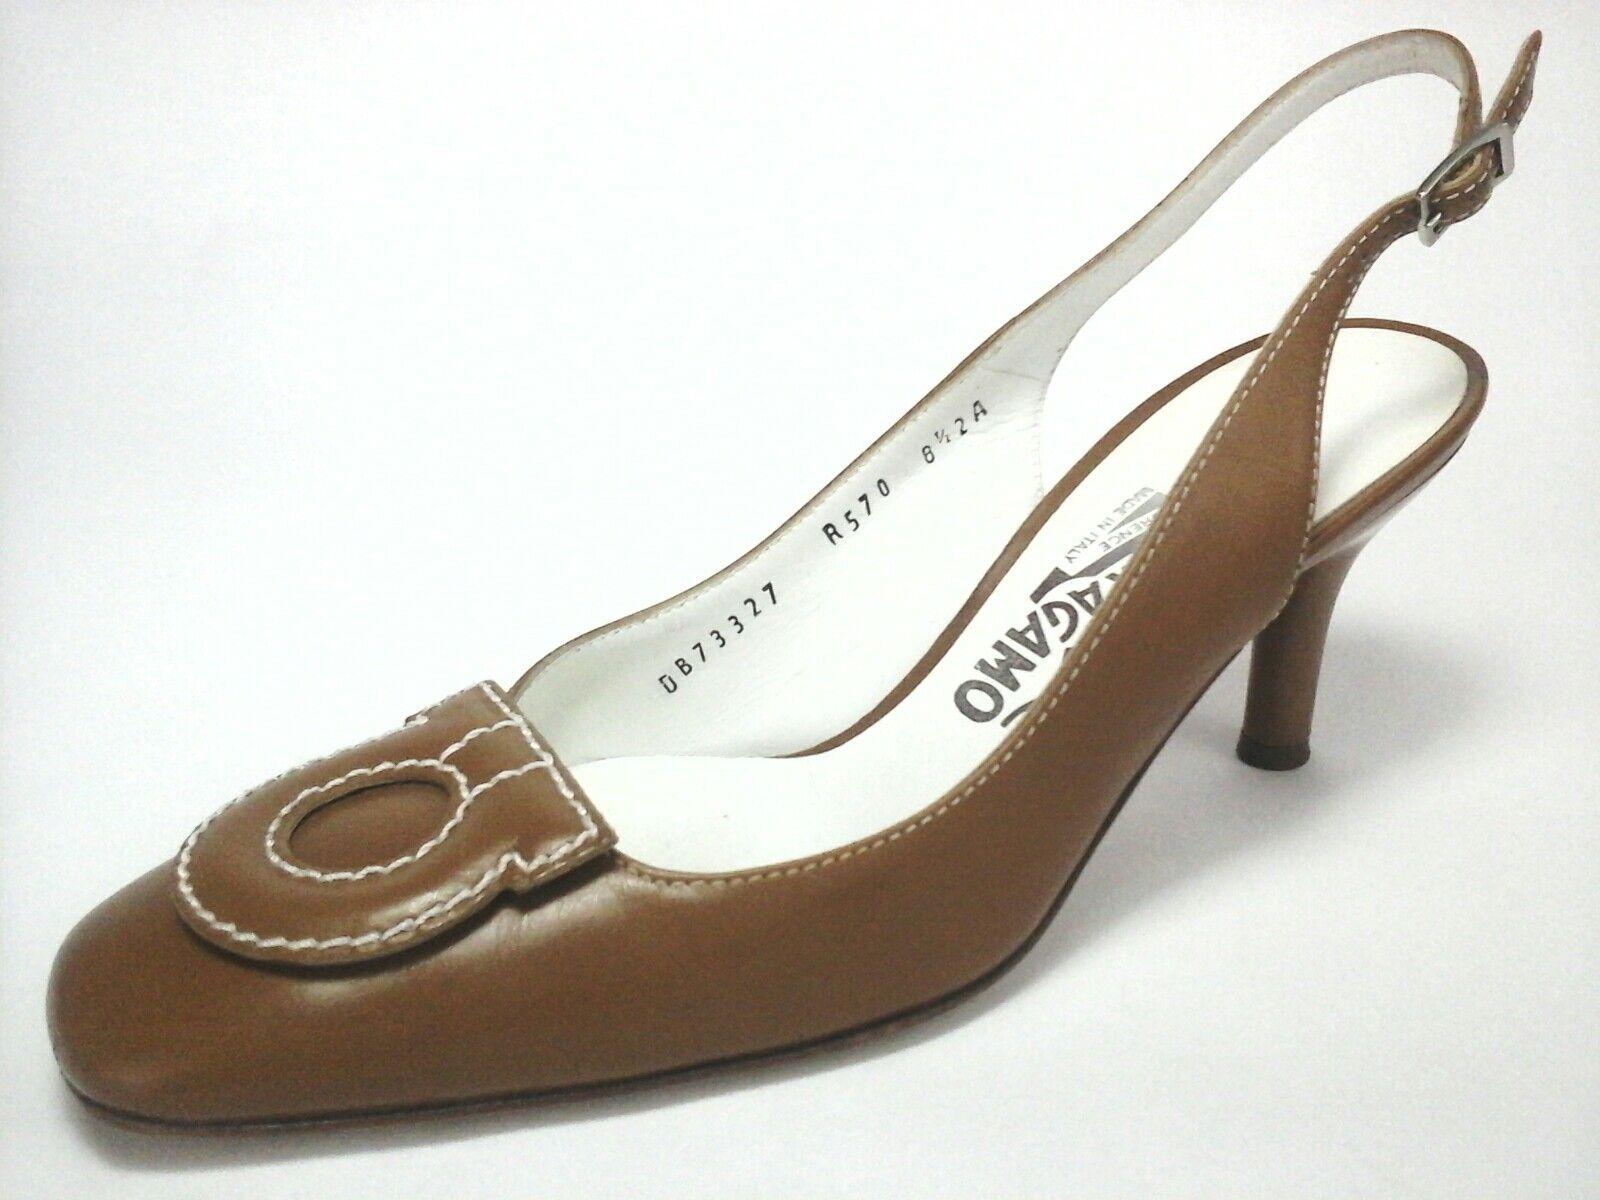 SALVATORRE FERRAGAMO Heels Pumps Tan Brown GANCINI BIT US 8 8.5 AA EU.39  675